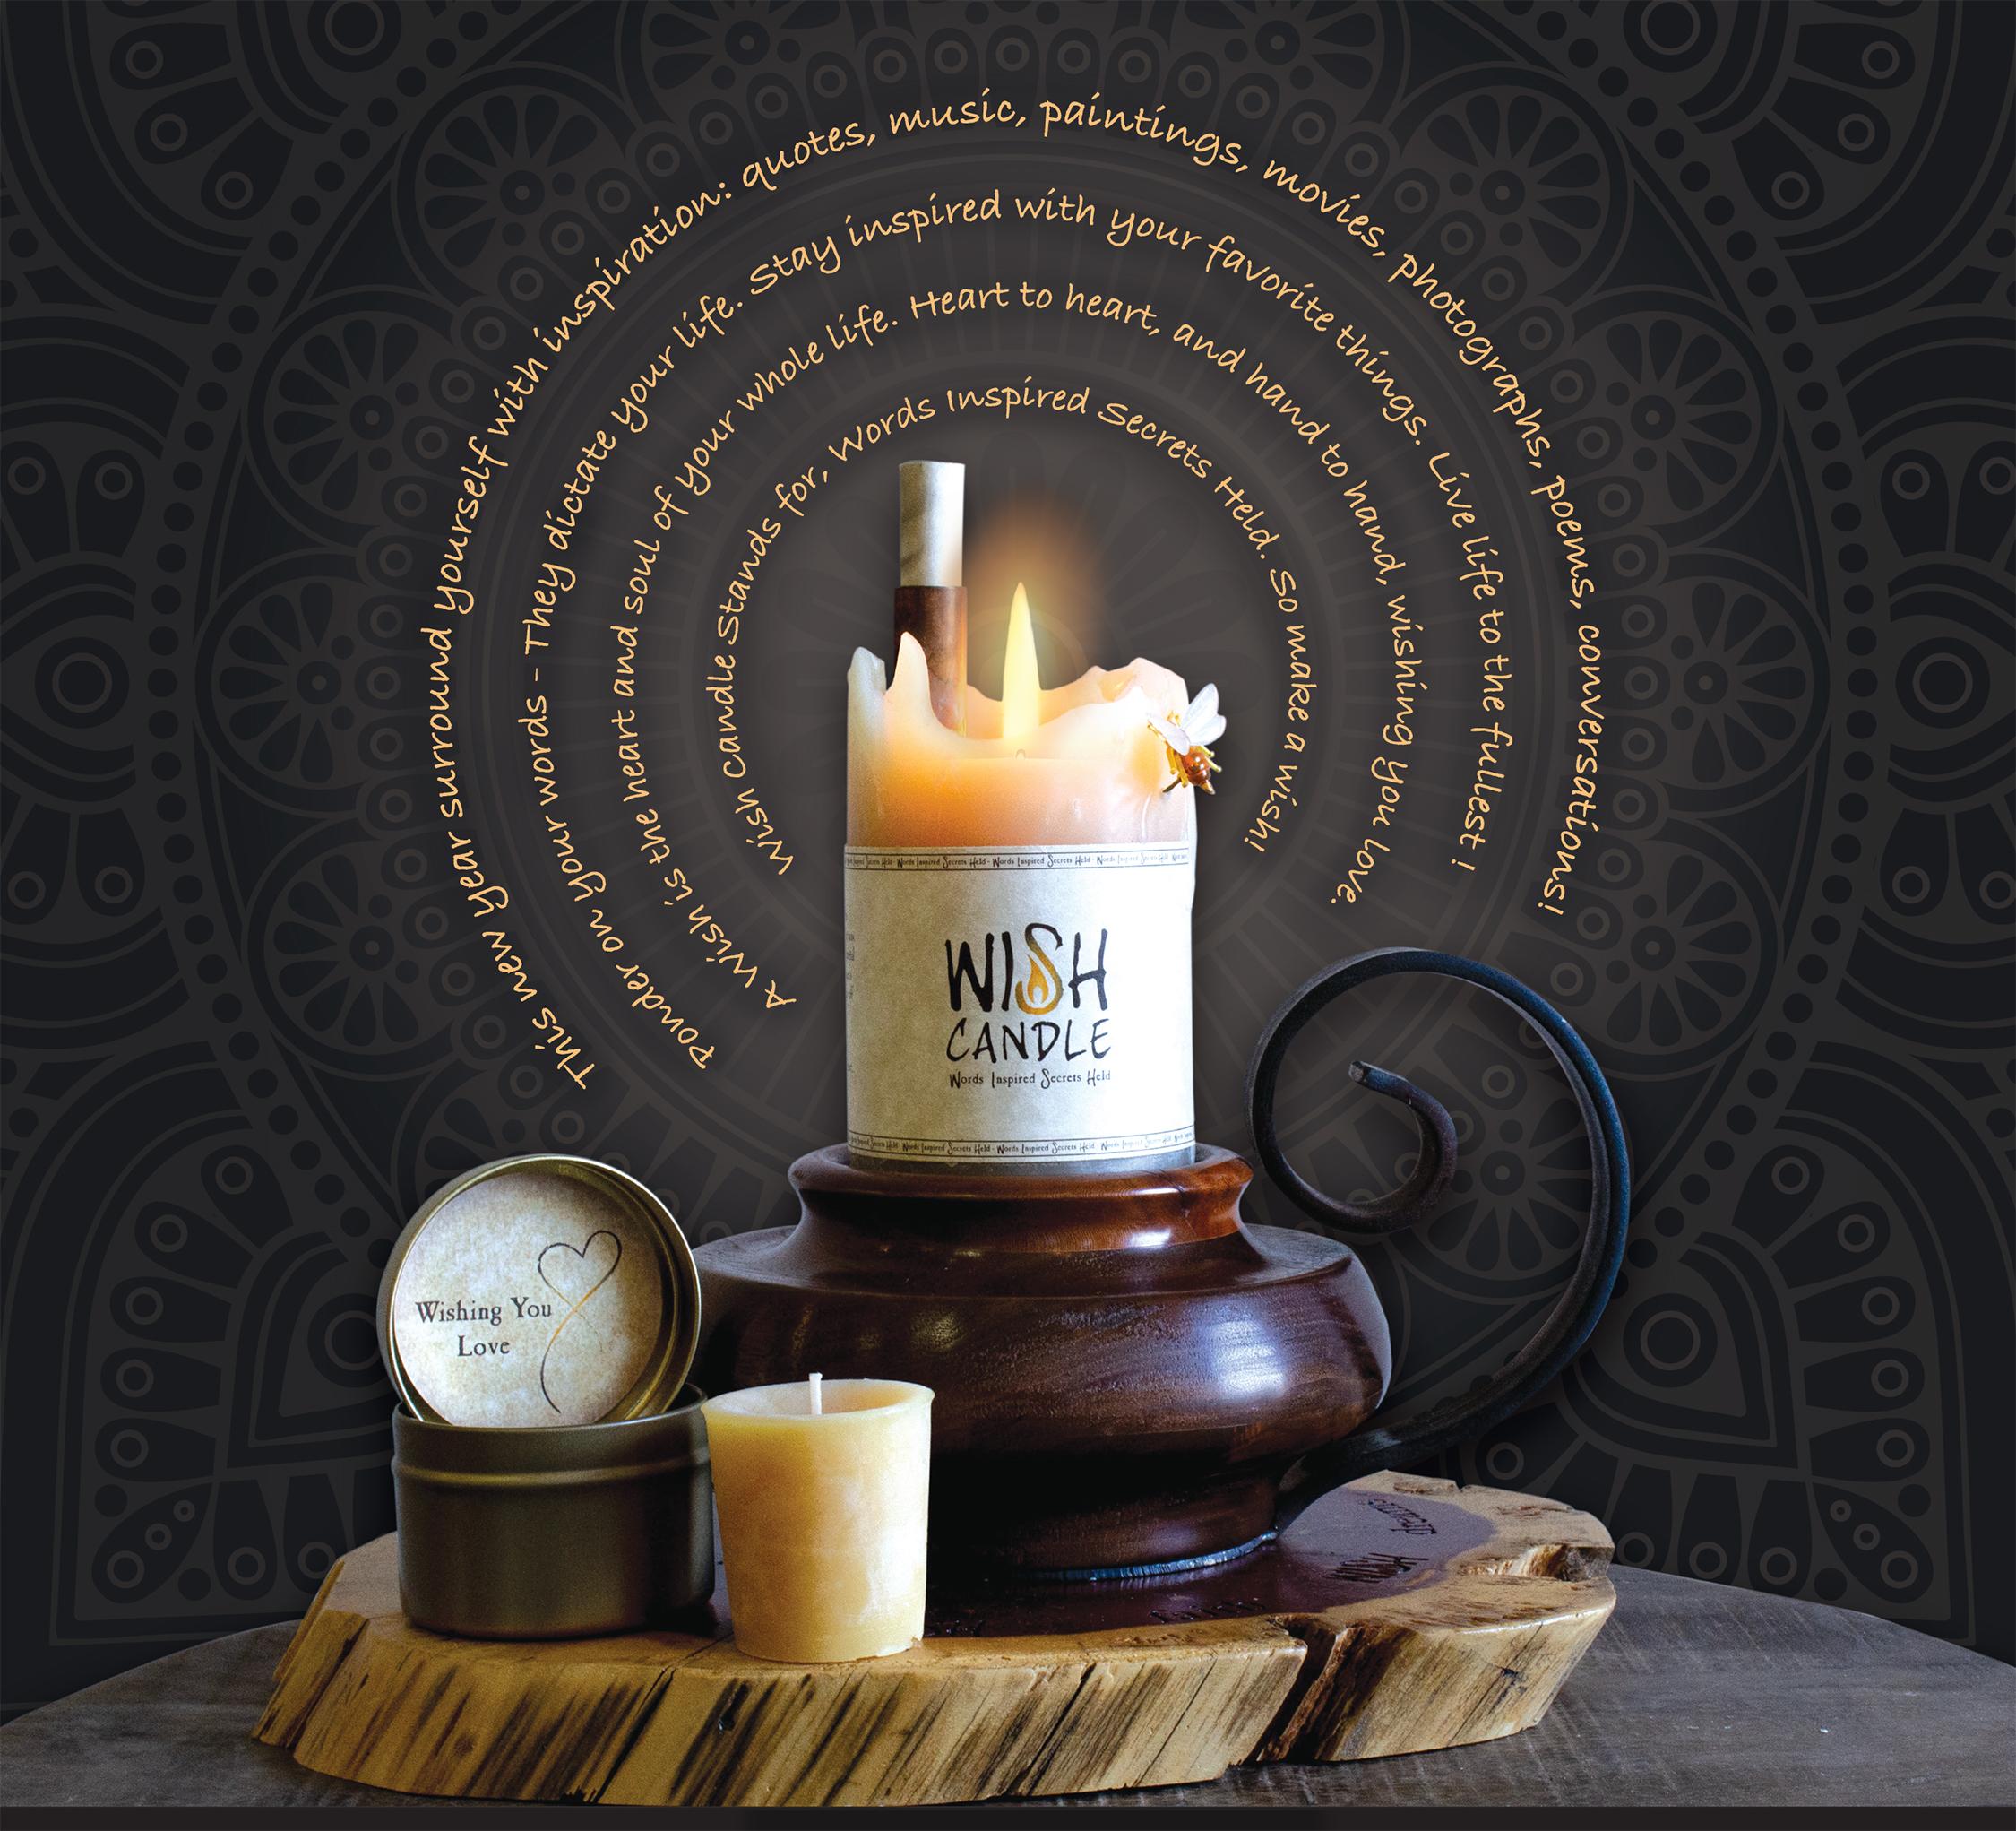 WEB Wish Candle Ad.jpg